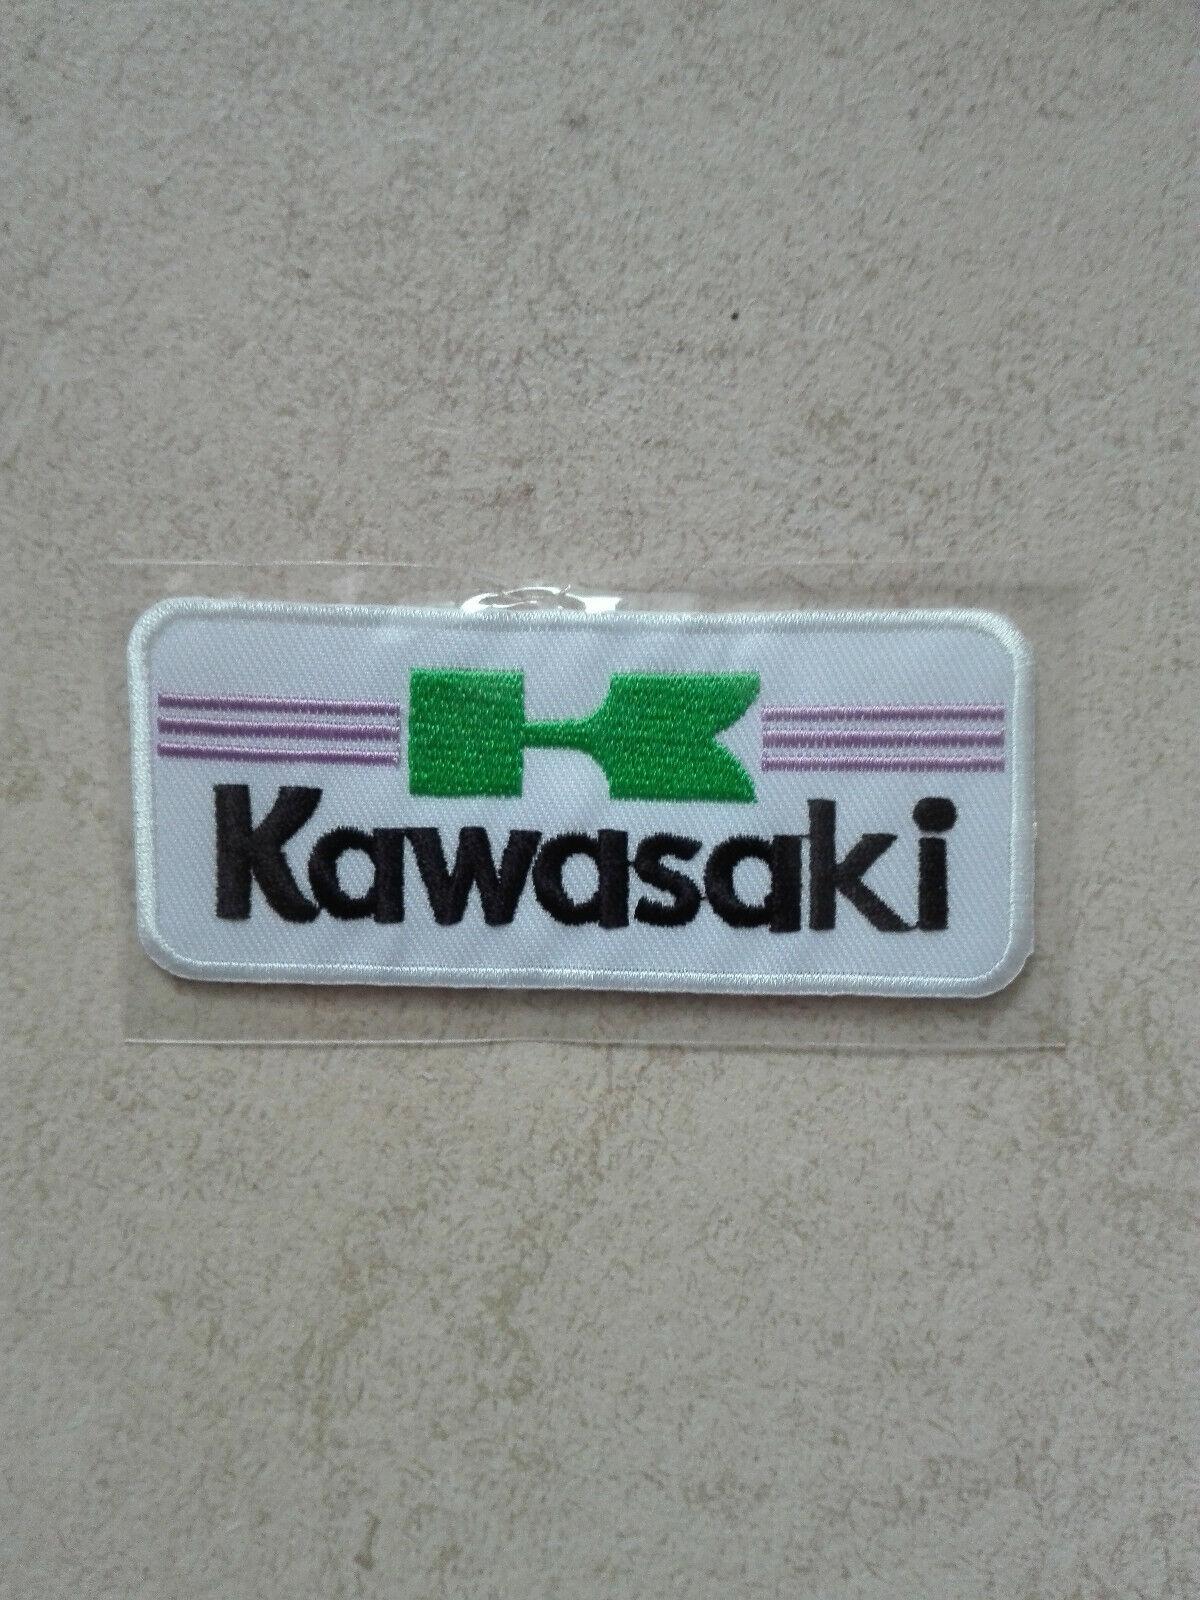 Aufnäher Patch Kawasaki Racing Motorsport Autocross Tuning Biker Chopper Patches